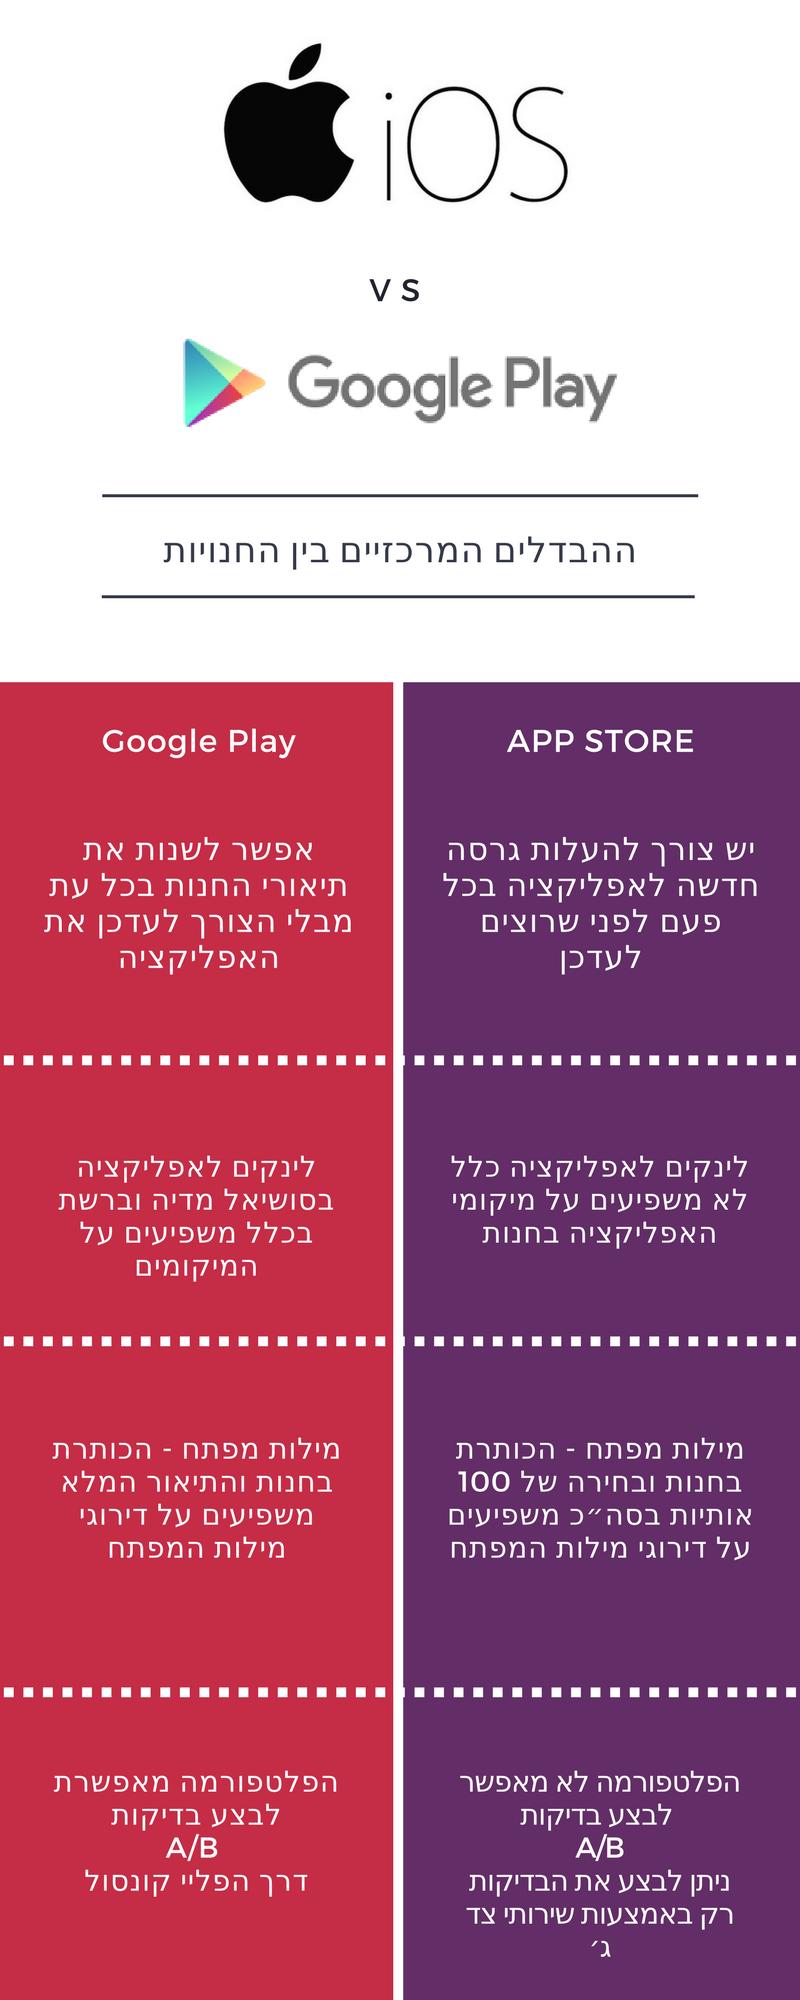 iOS Vs Google Play ההבדלים בין החנויות